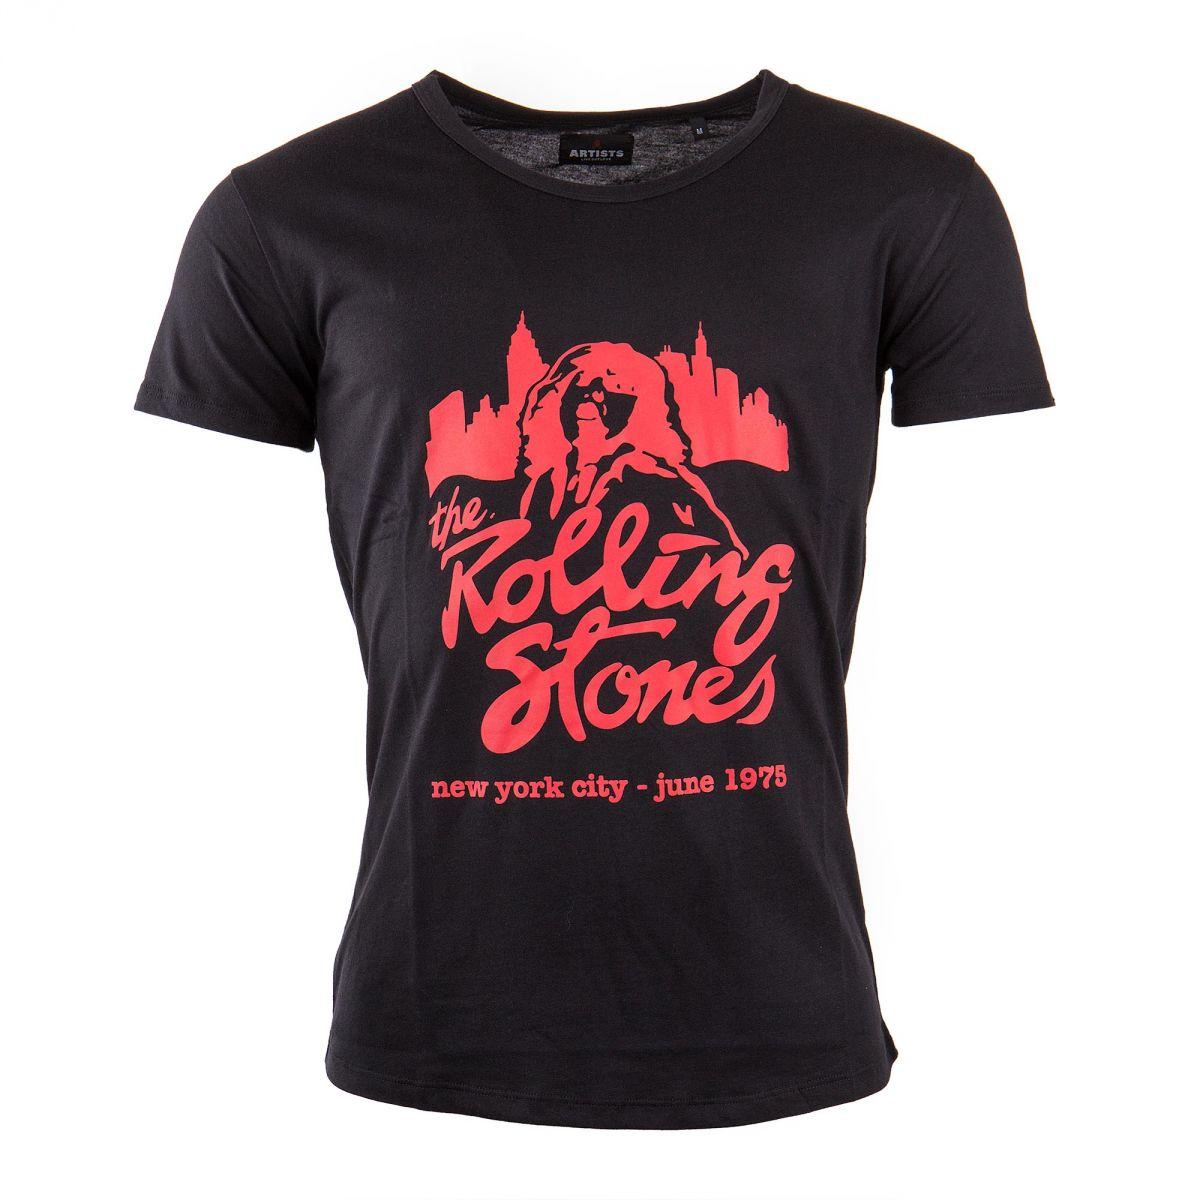 t shirt manches courtes noir the rolling stones homme artists prix. Black Bedroom Furniture Sets. Home Design Ideas